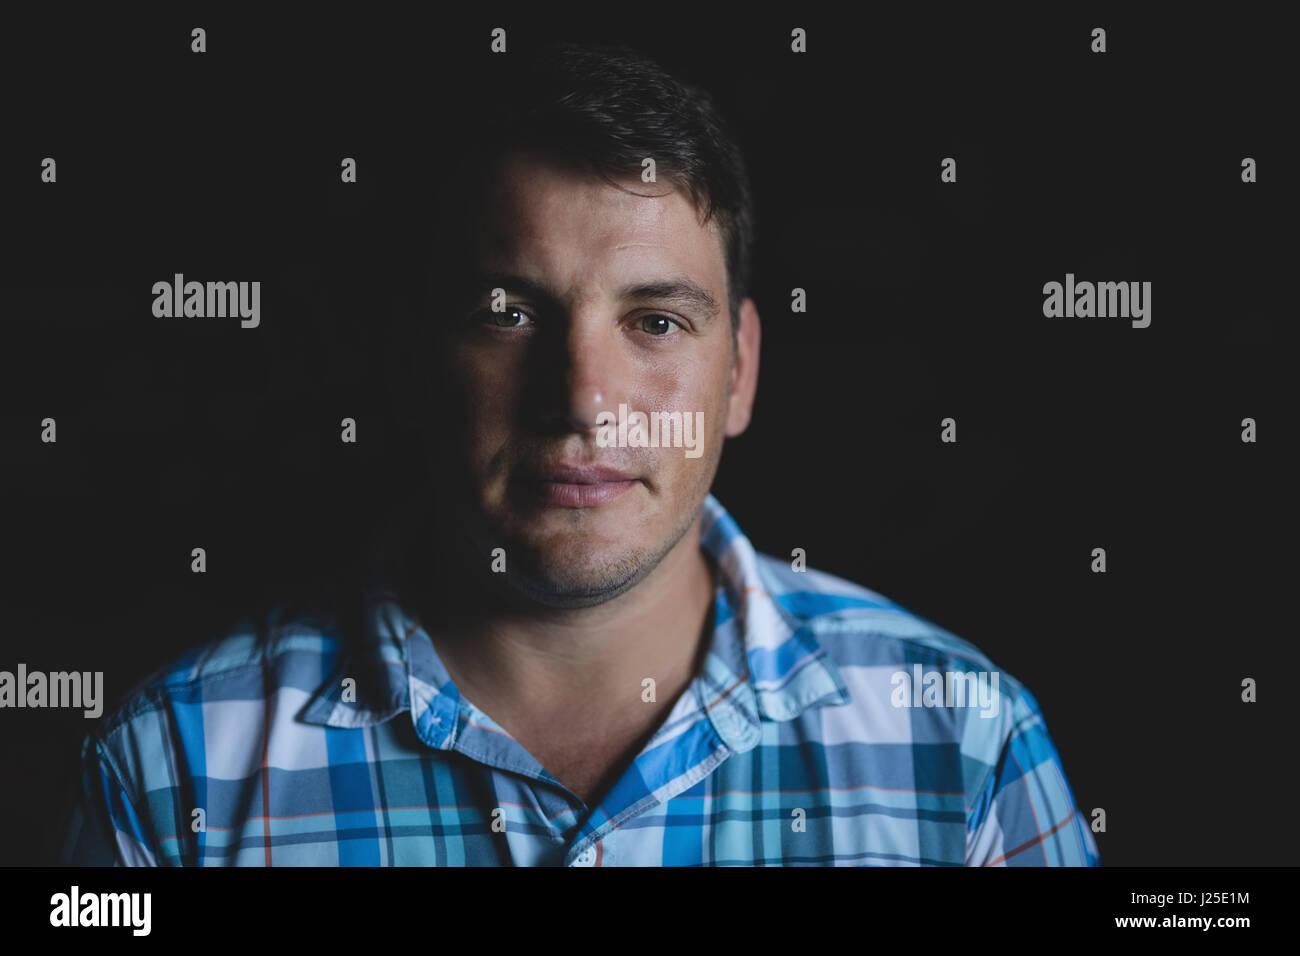 Portrait of confident man against black background - Stock Image